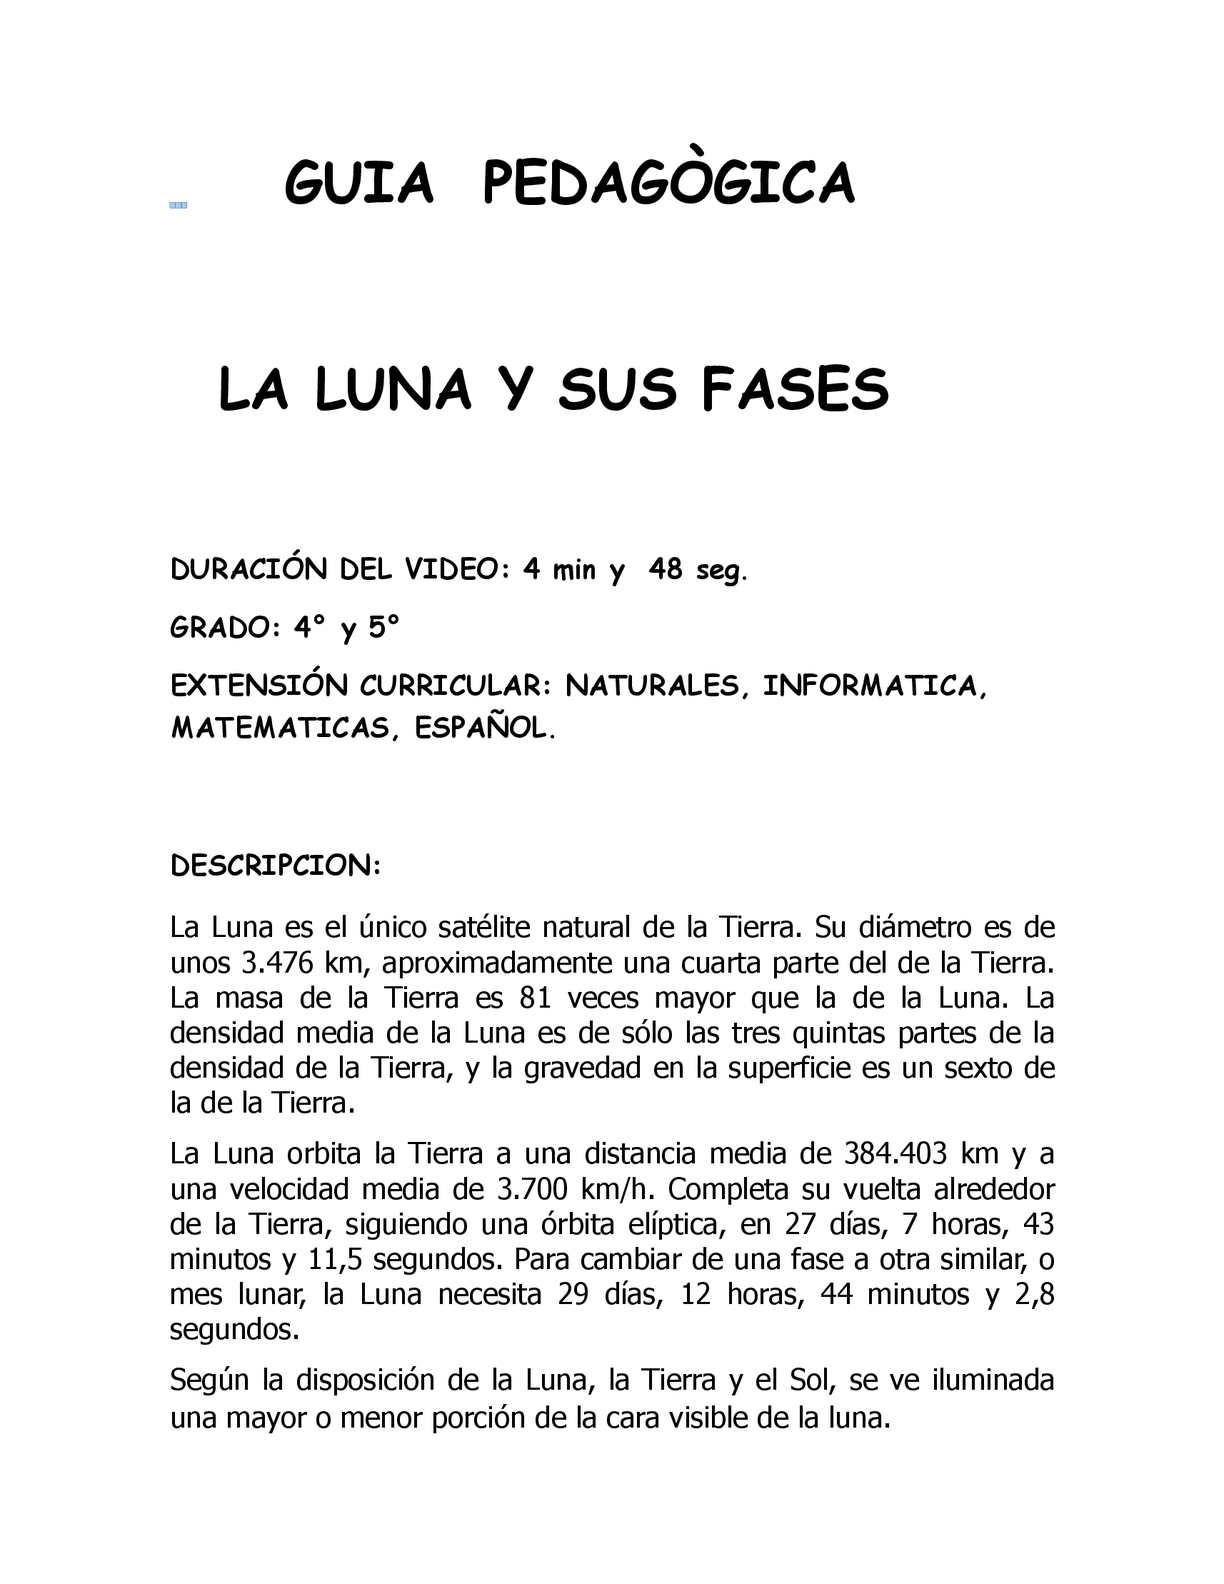 Guia Pedagògica La Luna Y Sus Fases